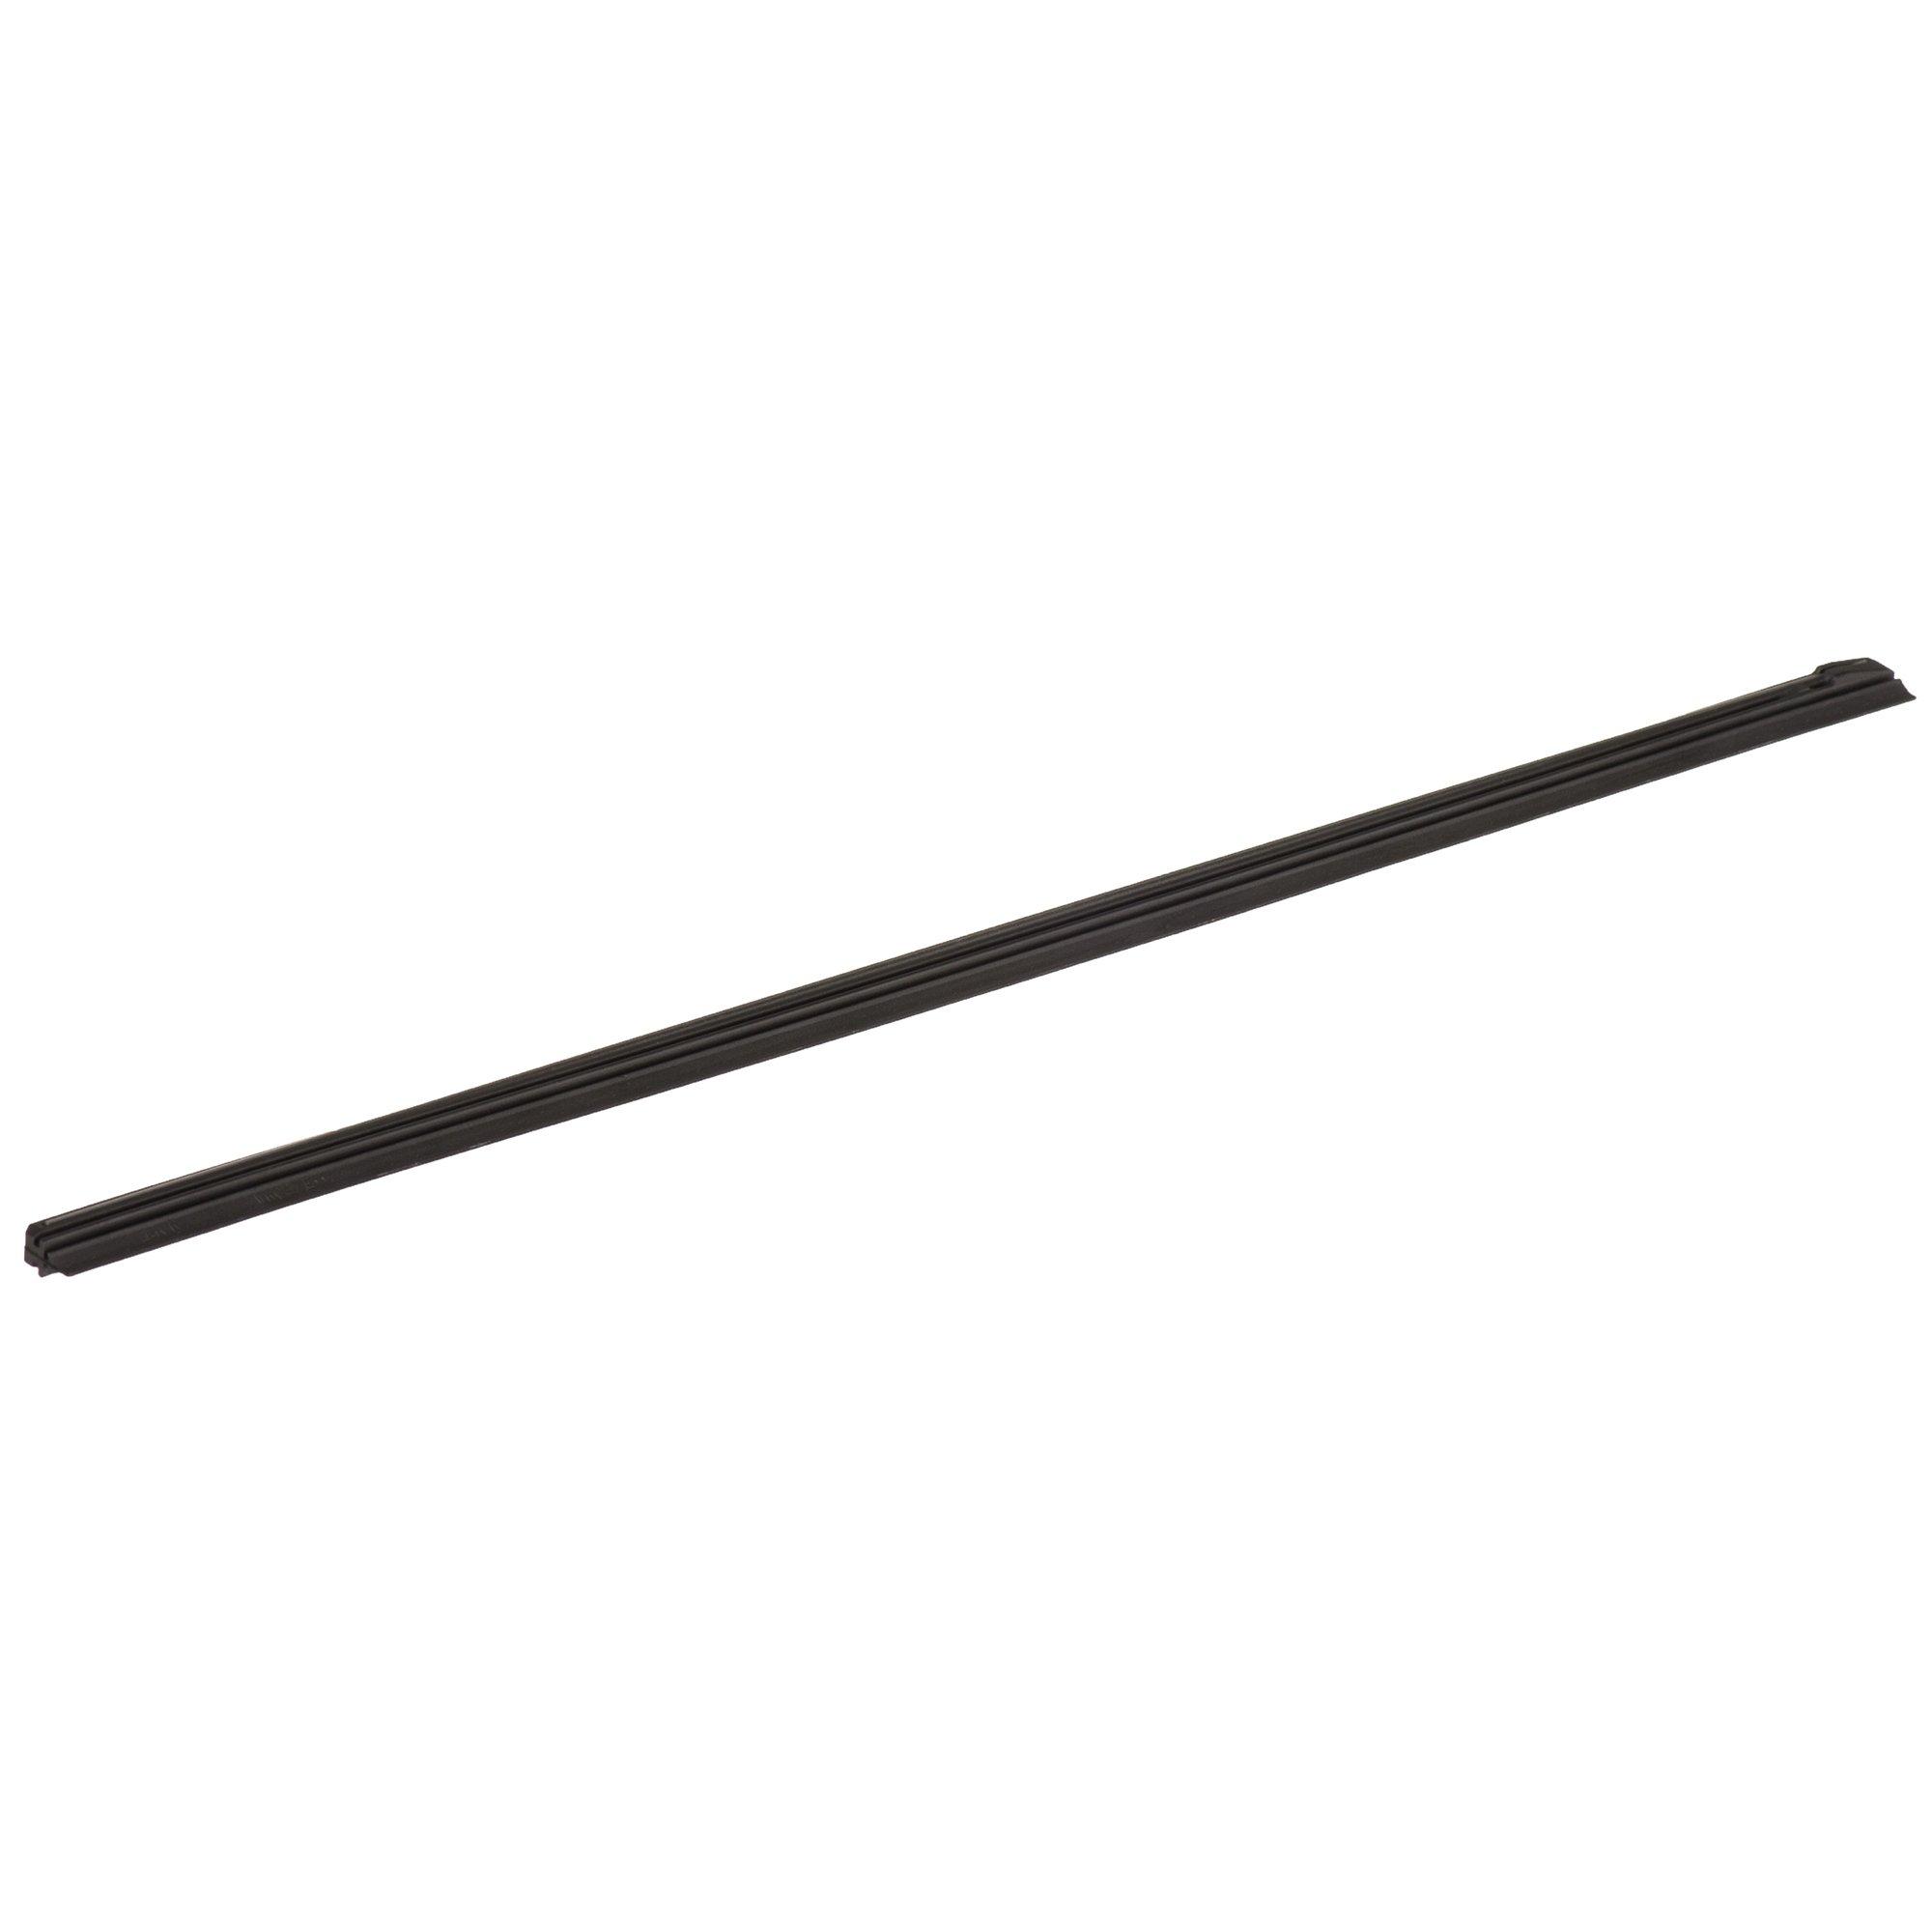 OEM NEW Windshield Washer Wiper Blade Insert Right 14-17 Kia Forte 98361-3X000